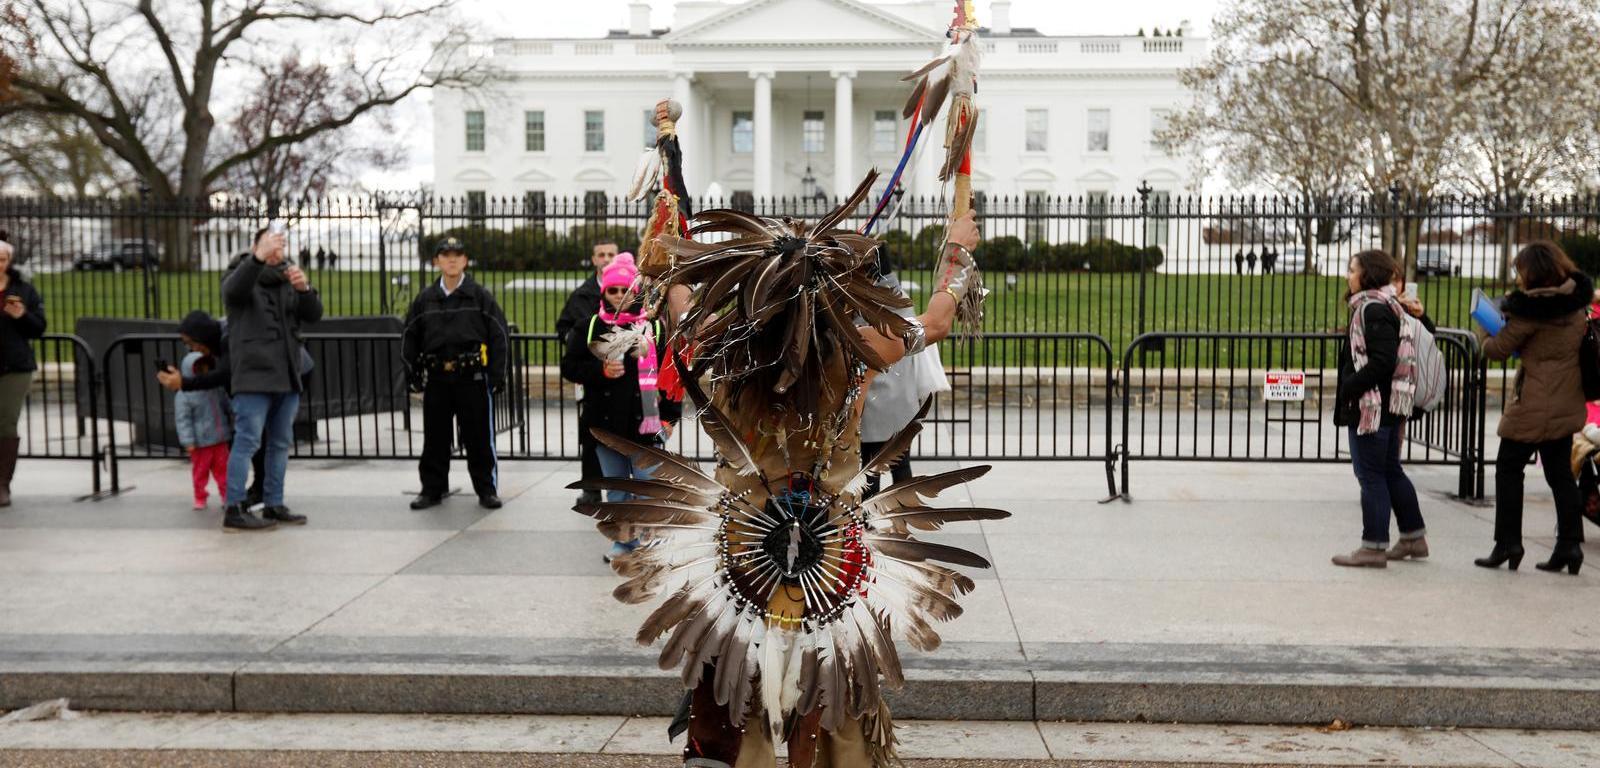 https://www.reuters.com/article/us-north-dakota-pipeline-protests-idUSKBN16H2NB